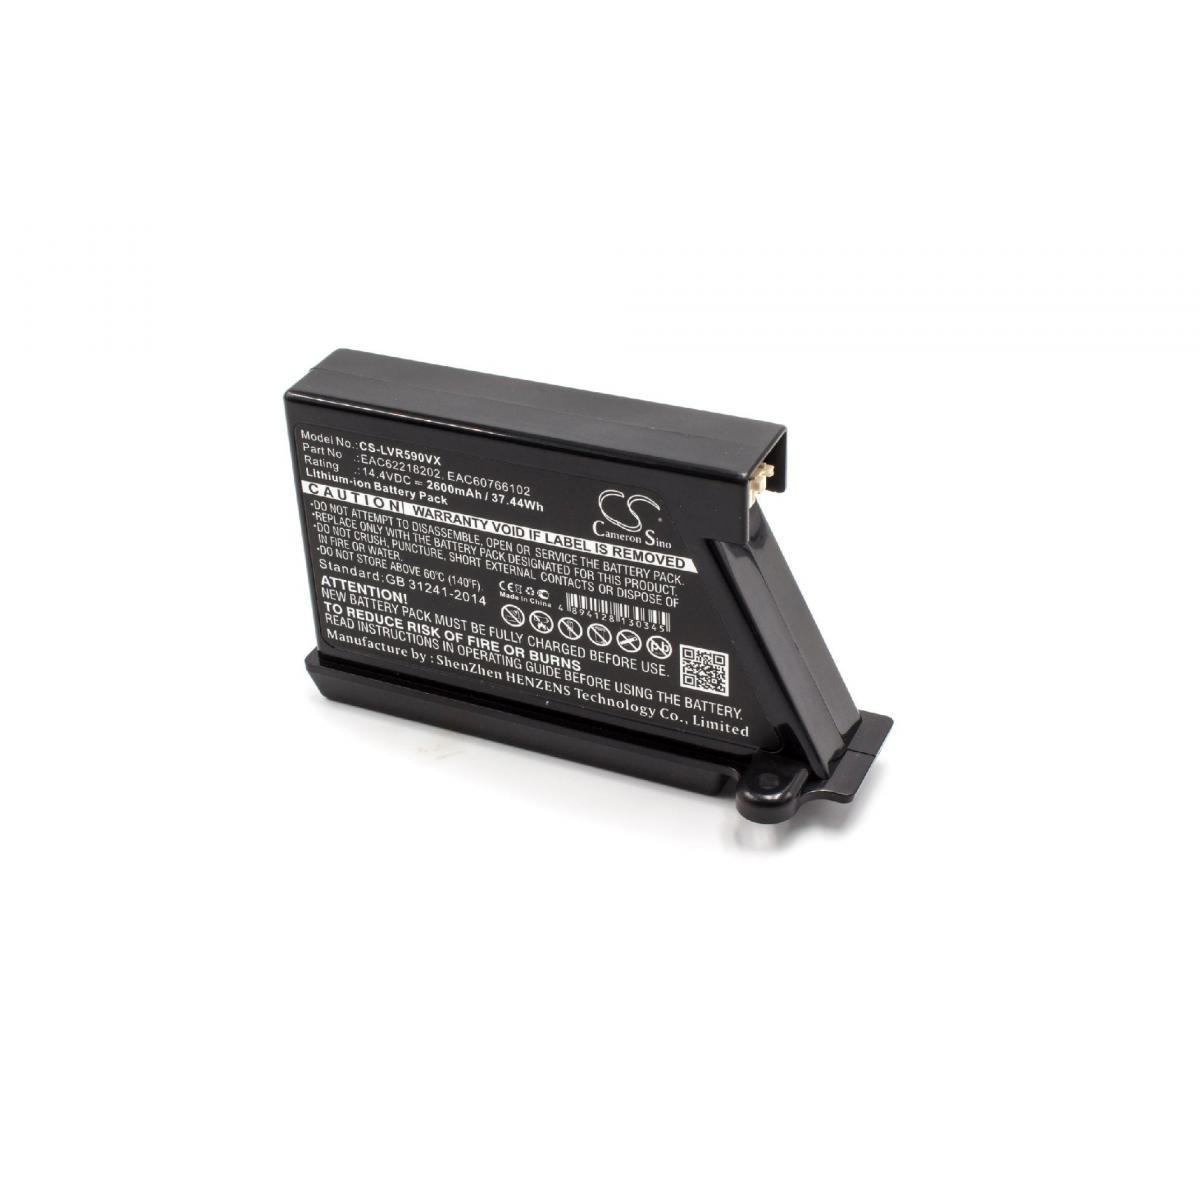 Vhbw vhbw Batterie compatible avec LG HOM-BOT VR65710LVMP, VR65713LVM, VR65715LVM robot électroménager (2600mAh, 14,4V, Li-io